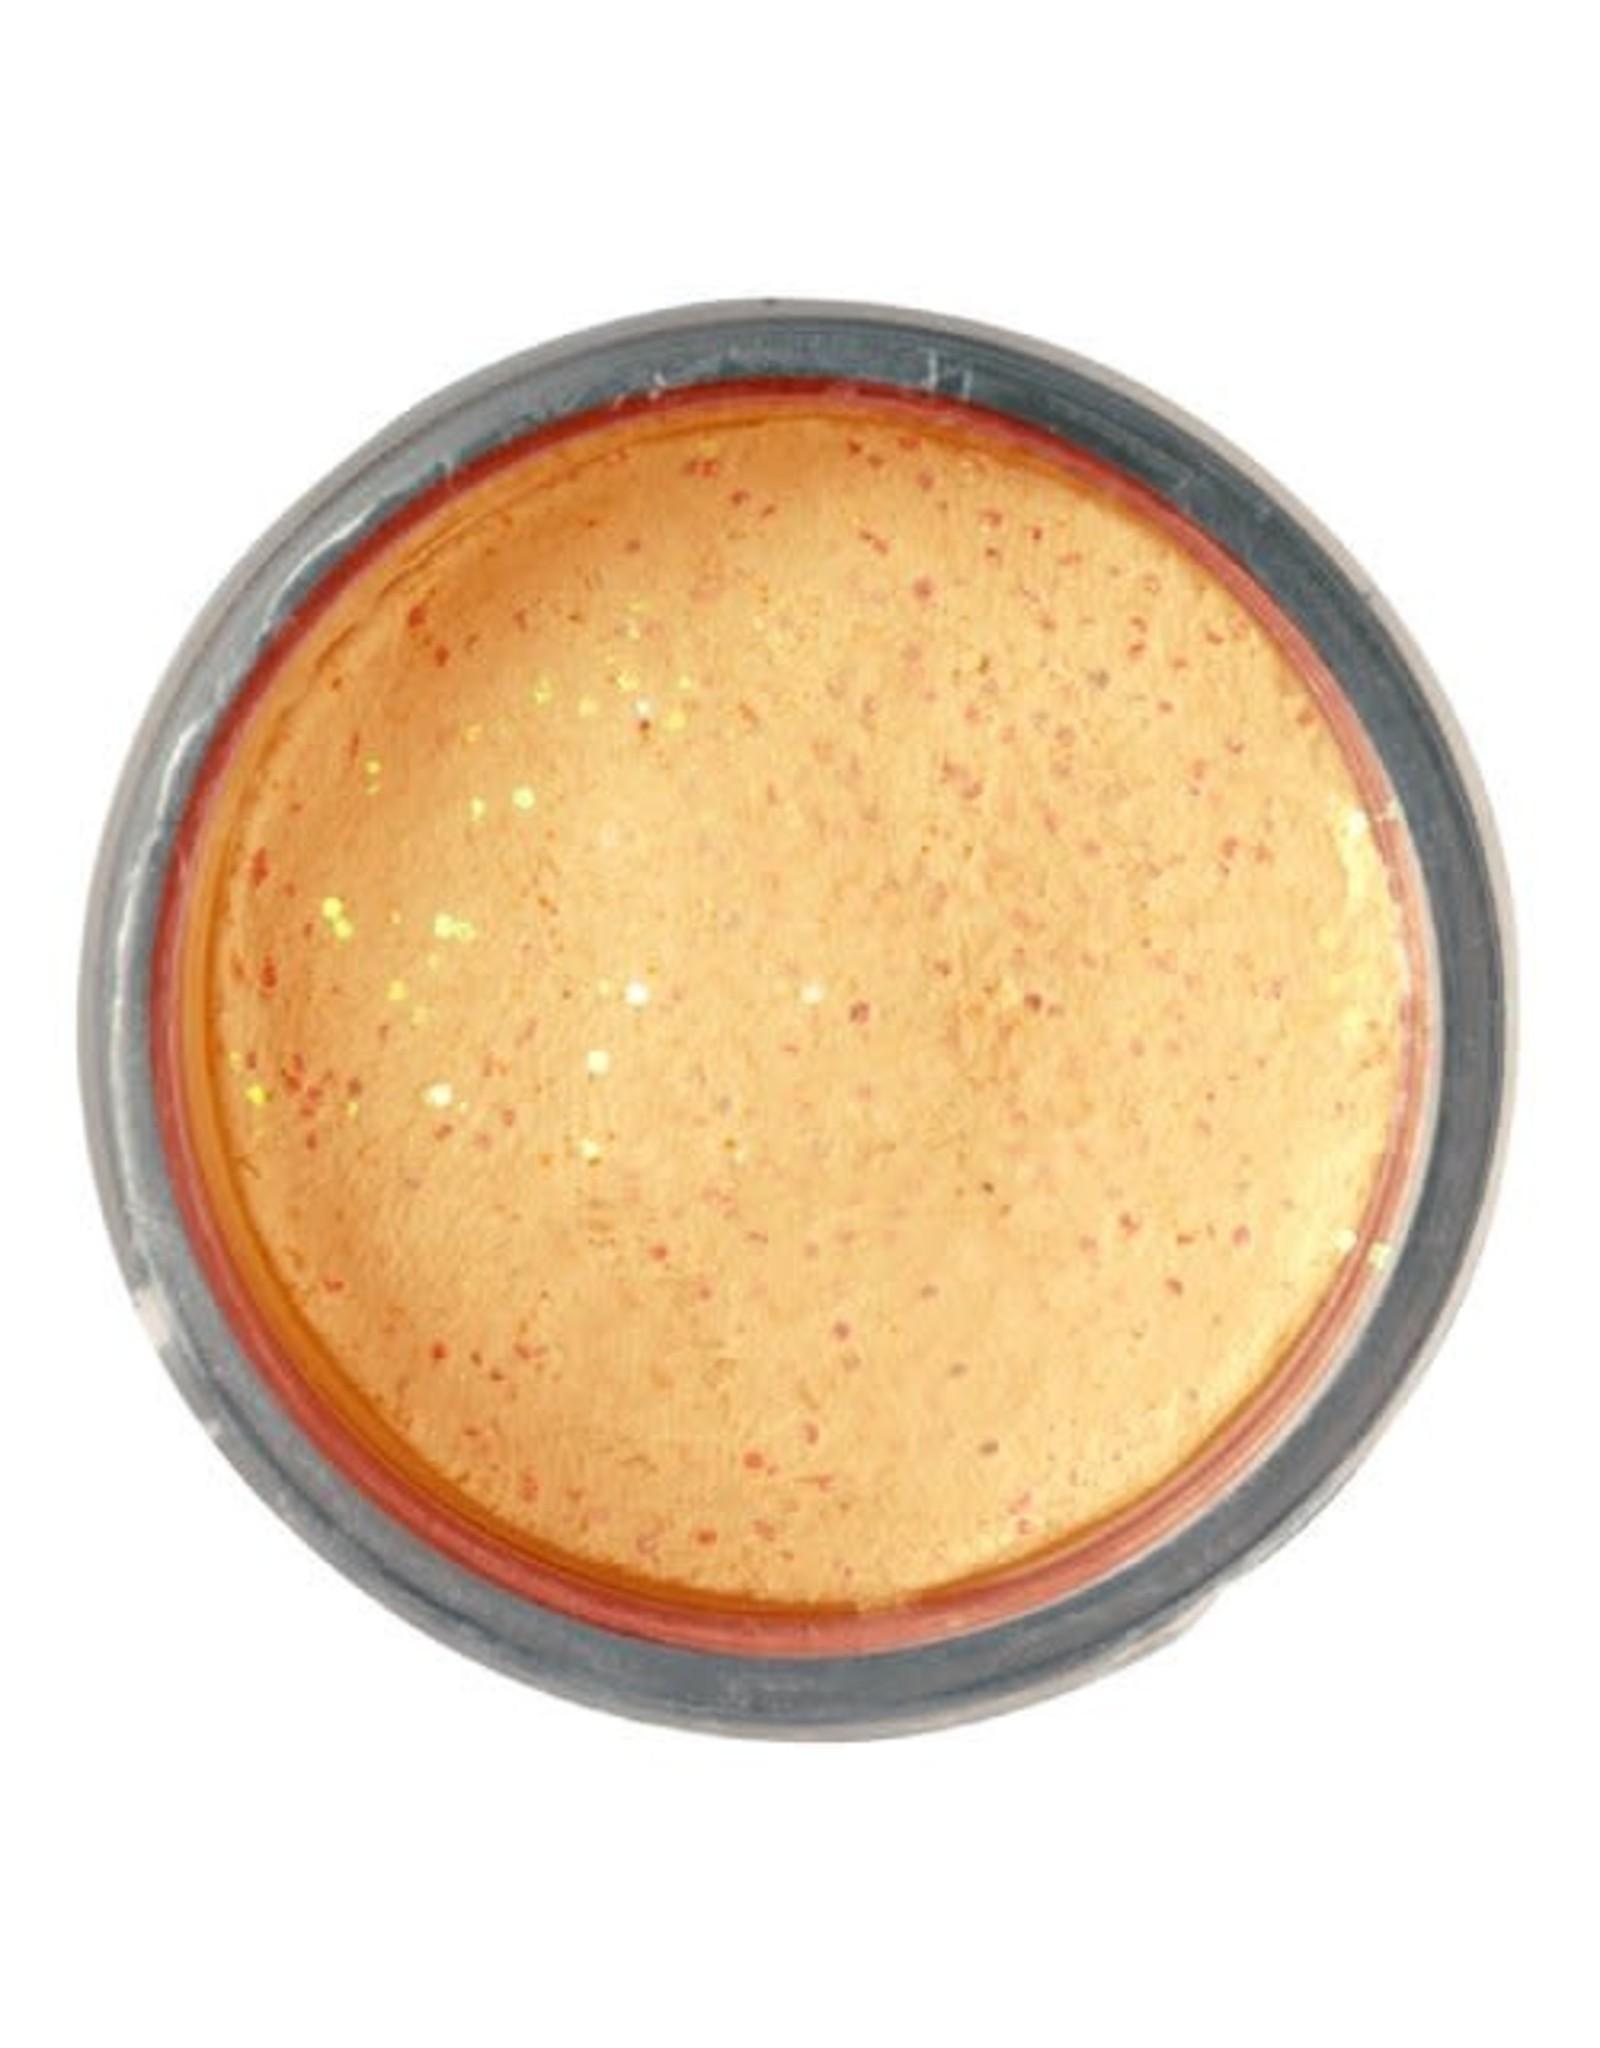 Berkley Berkley Gulp! Trout Bait - Chunky Cheese